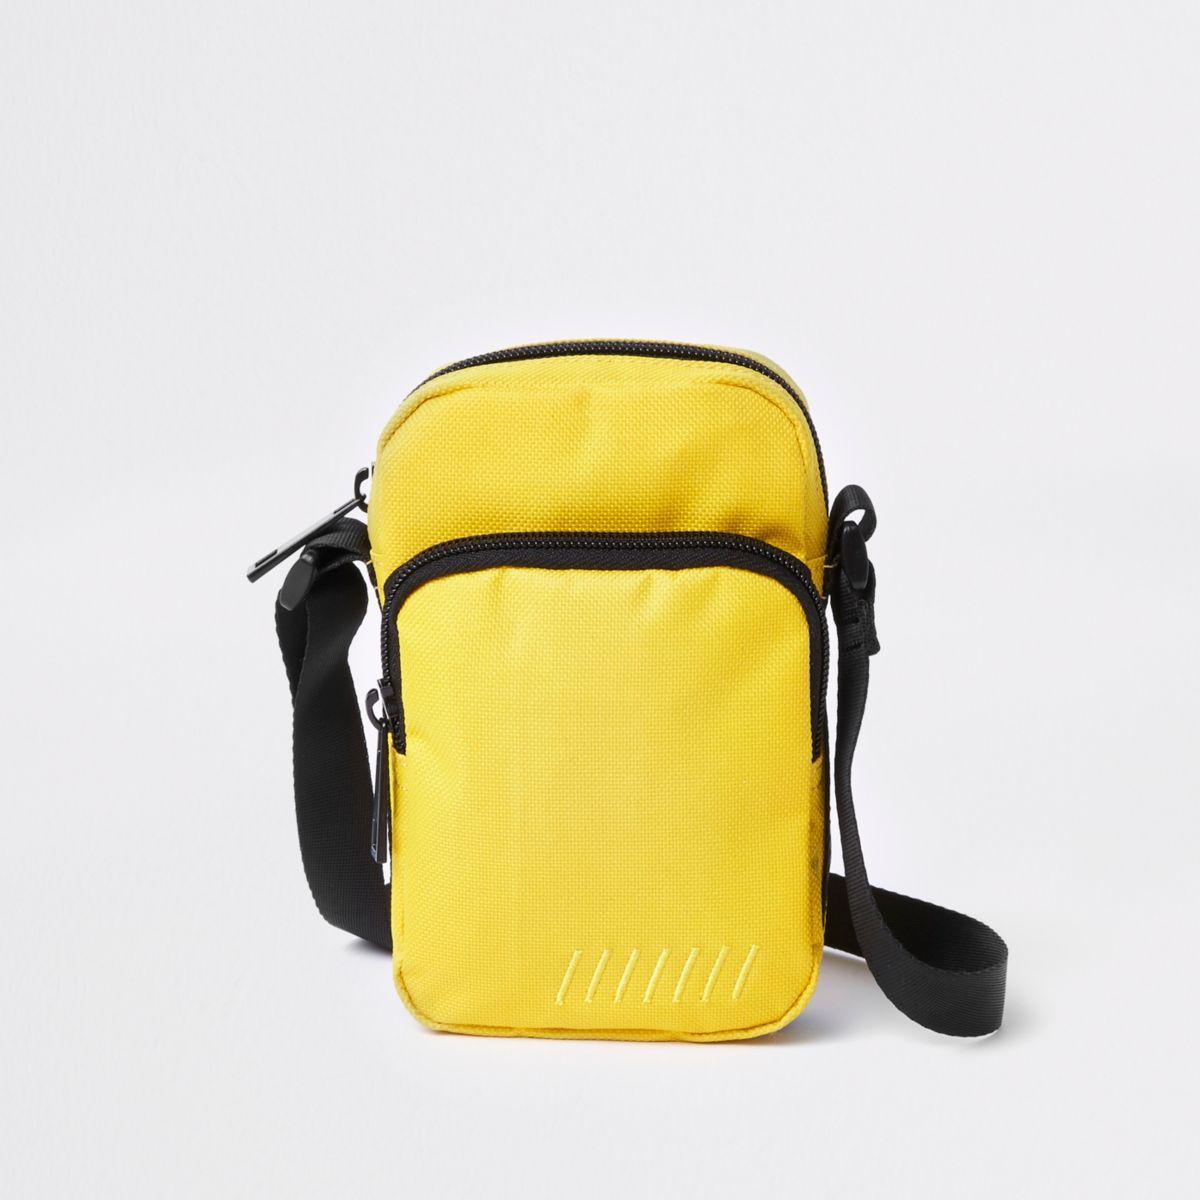 Yellow mini cross body flight pouch